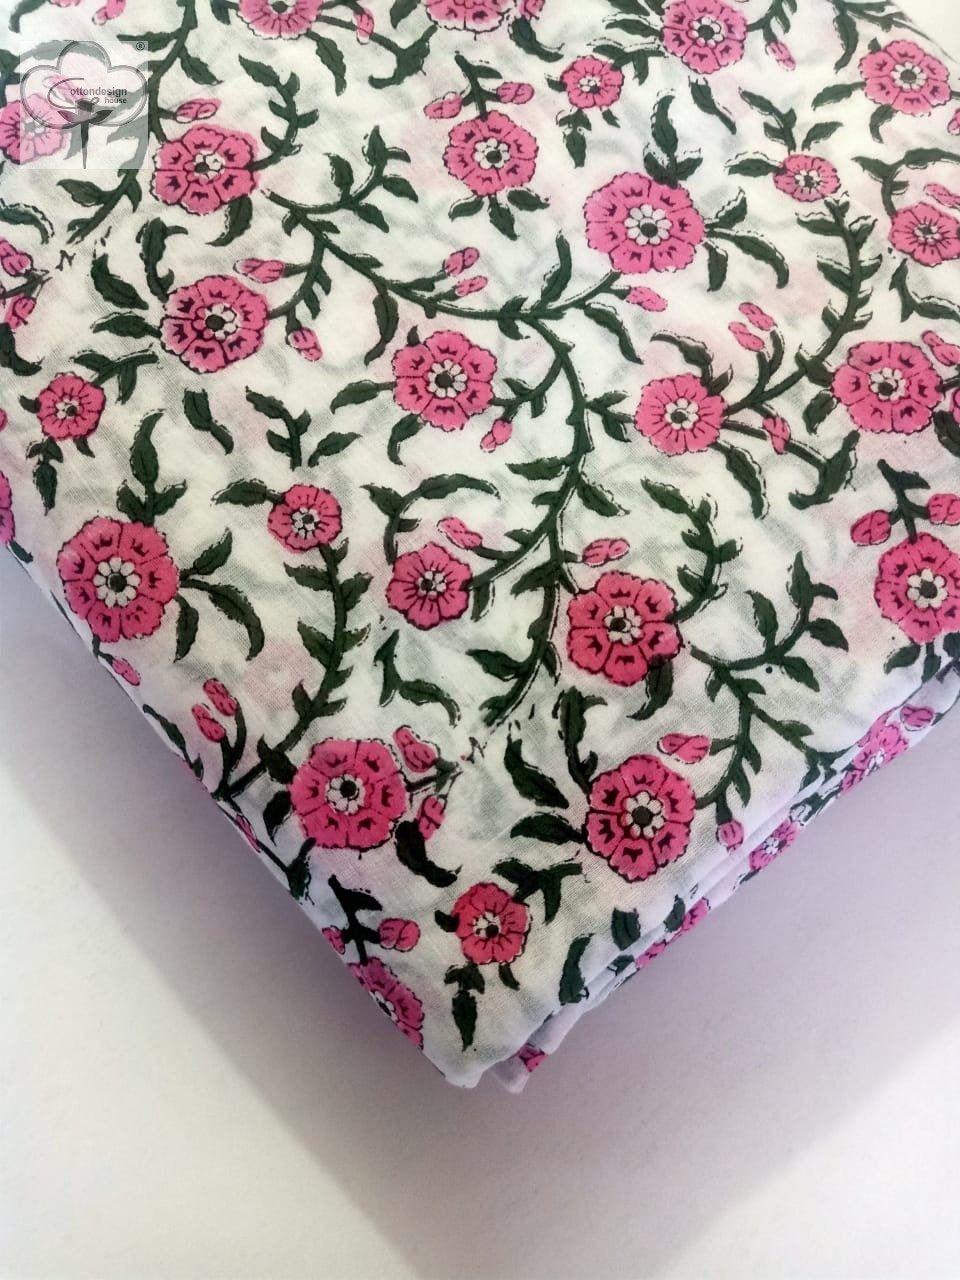 Summer Dress Voile Cotton Fabric Hand Block Print Fabric By Etsy In 2021 Block Printing Fabric Printing On Fabric Floral Print Fabric [ 1280 x 960 Pixel ]